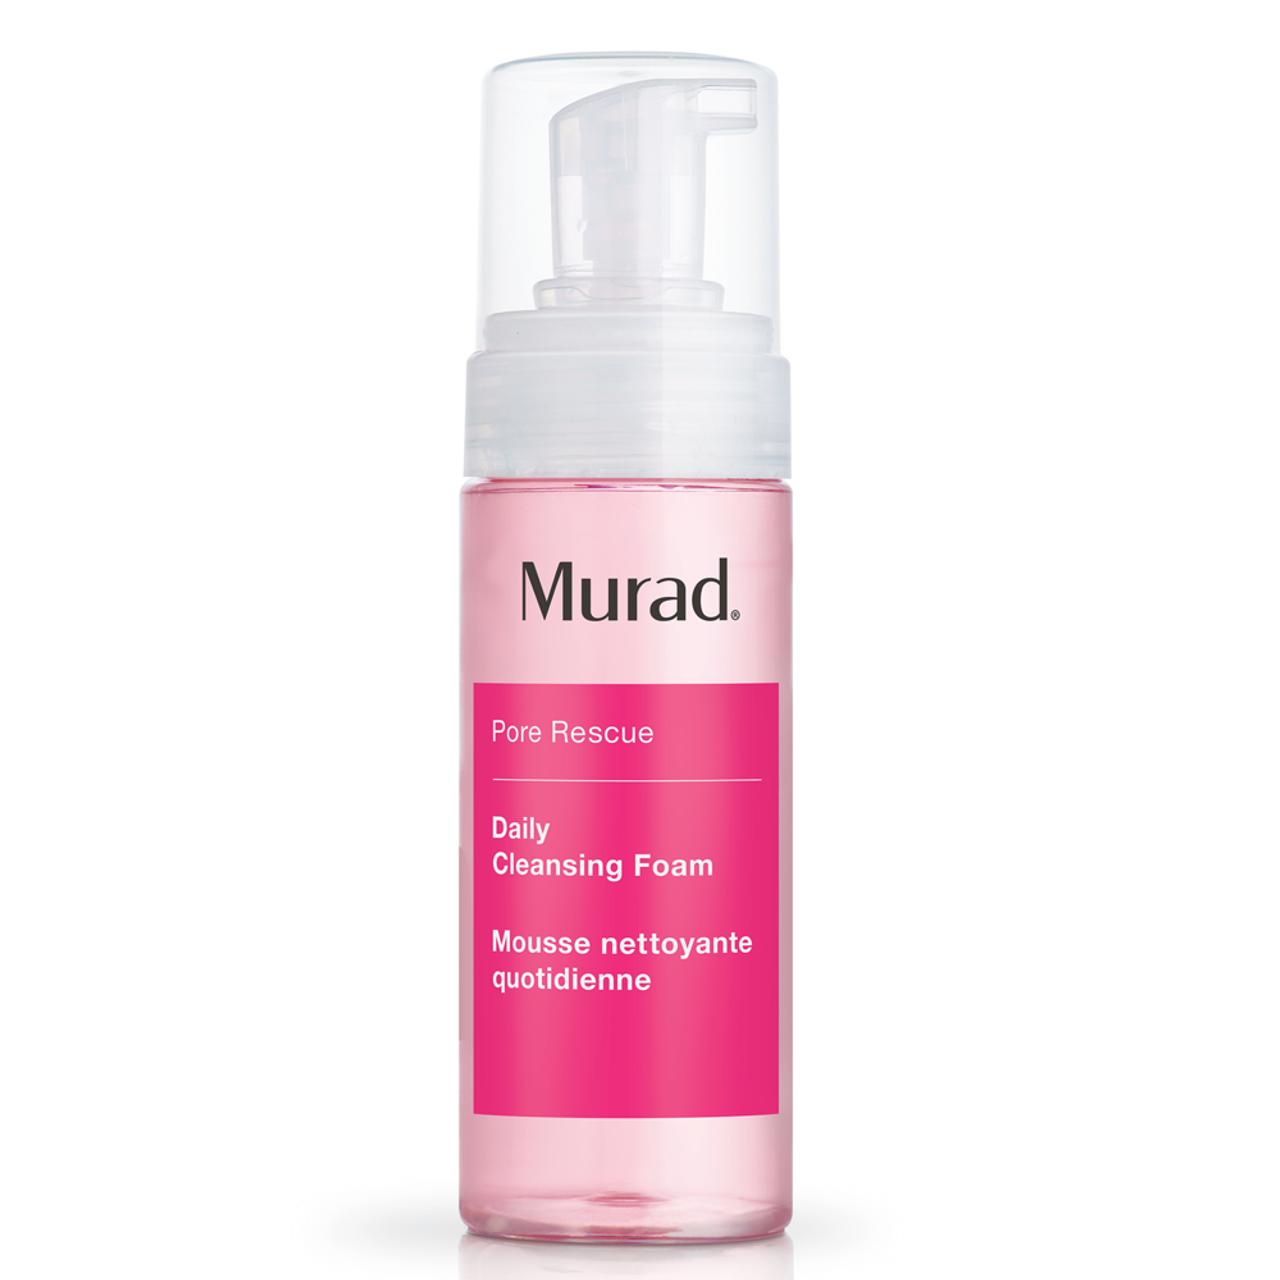 Murad Pore Rescue Daily Cleansing Foam (discontinued) BeautifiedYou.com